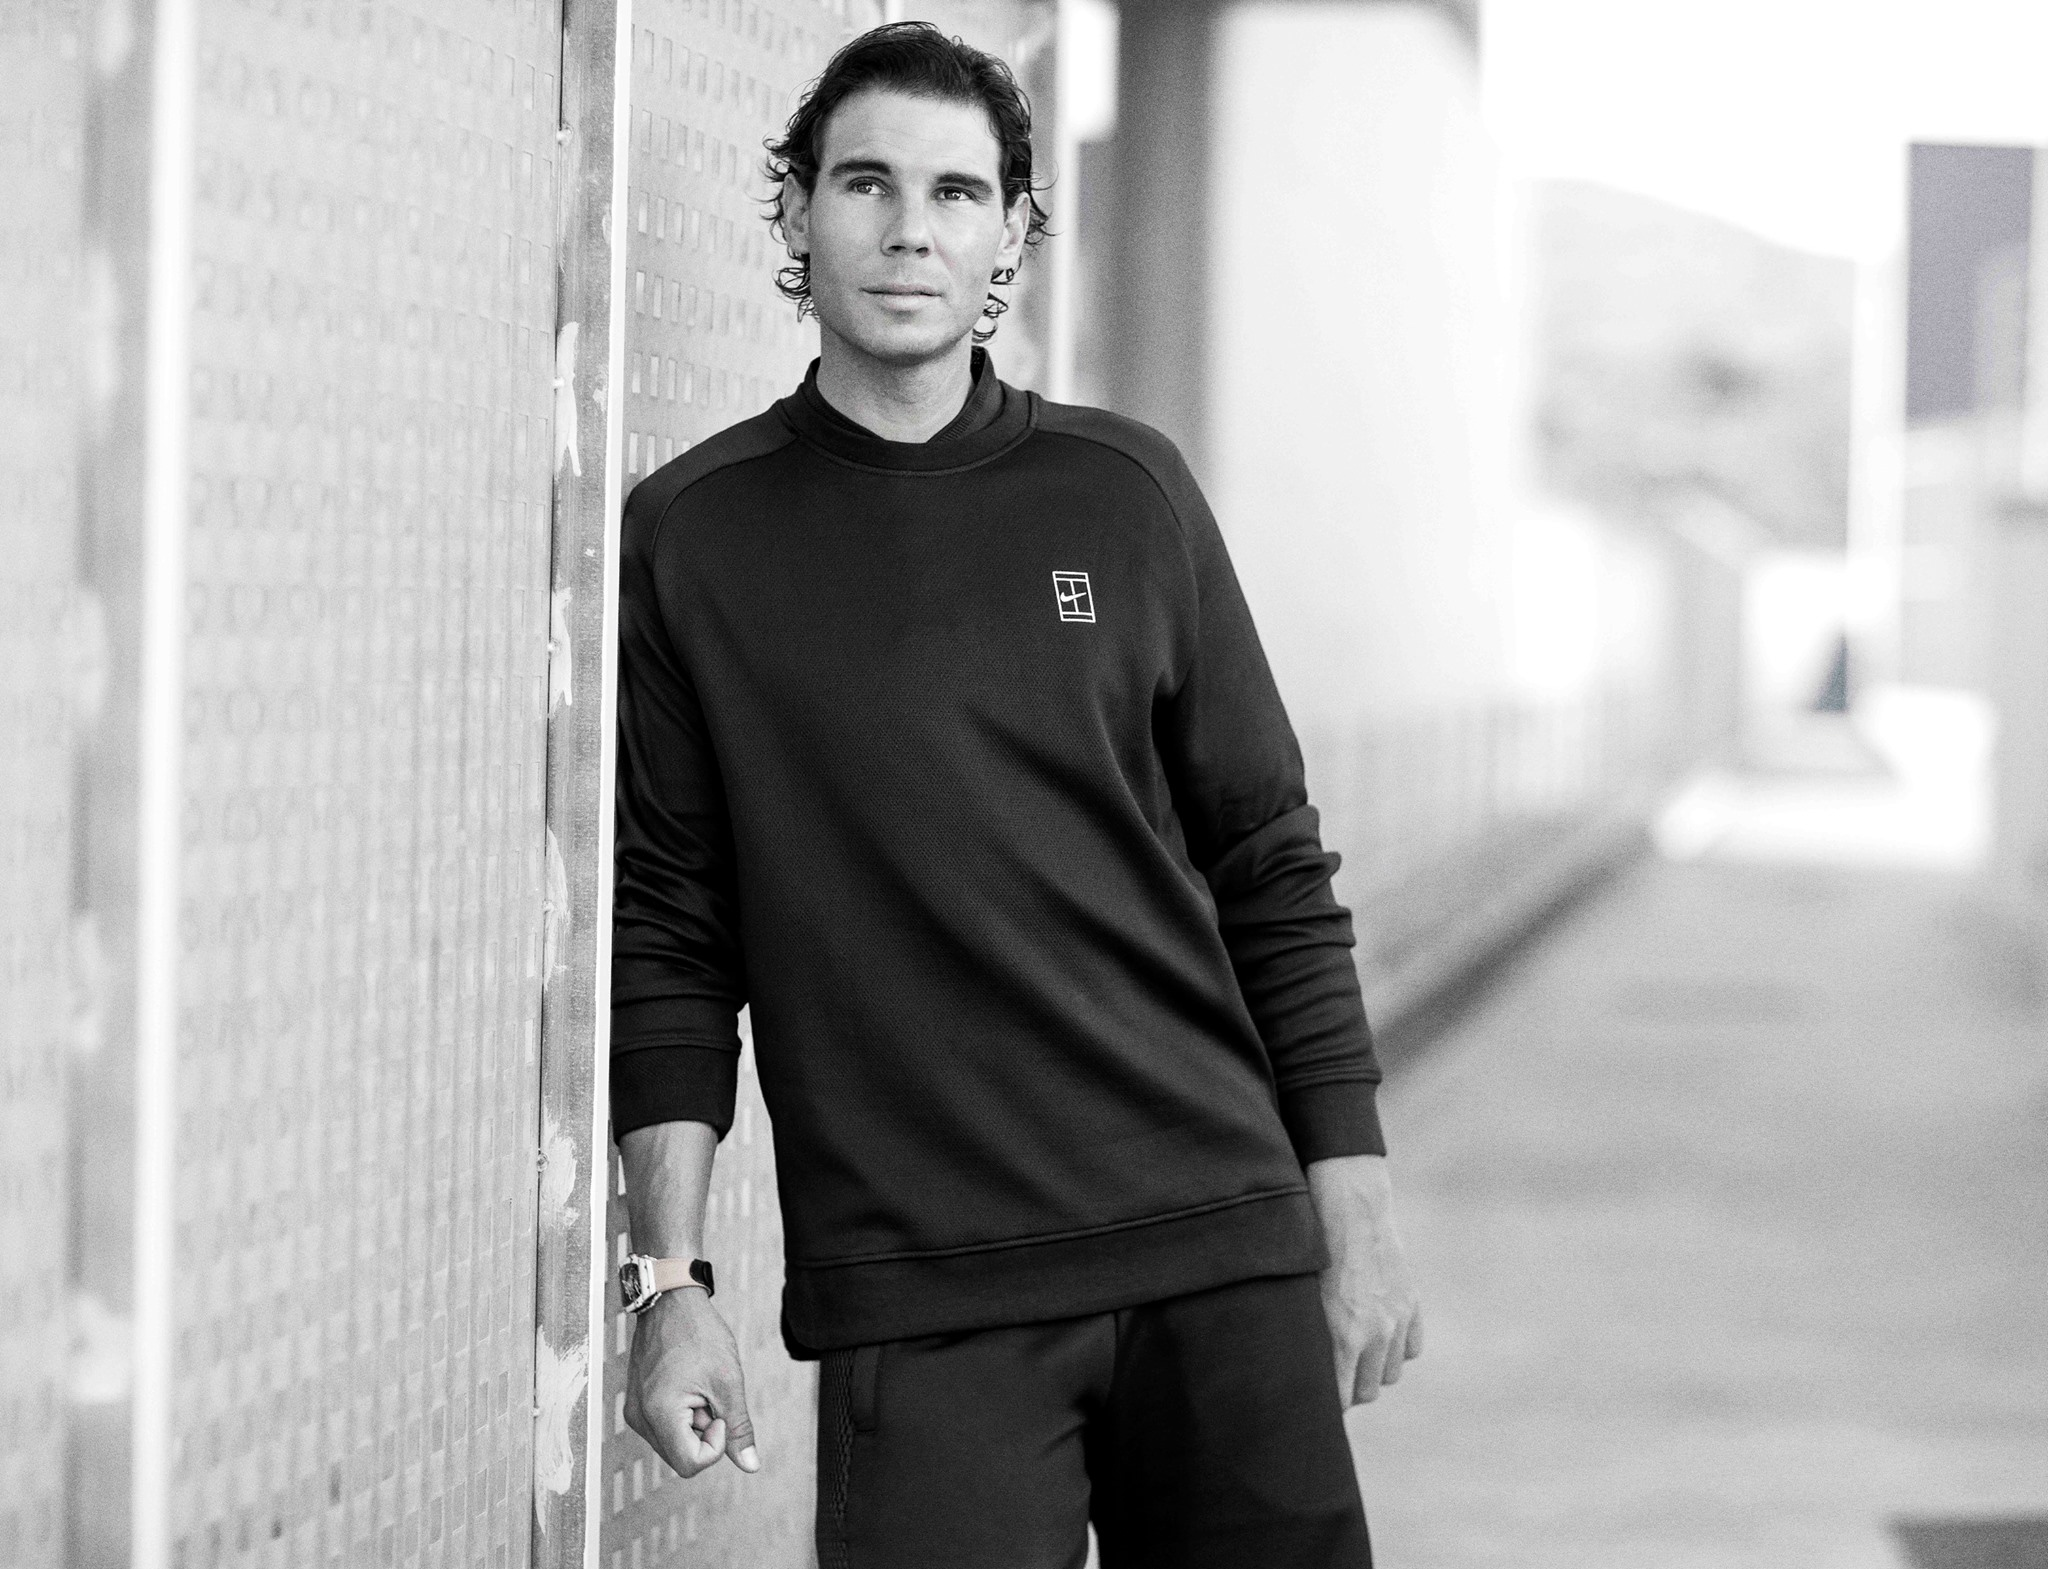 Roland Garros 2016 - Rafa Nadal - Nike Court